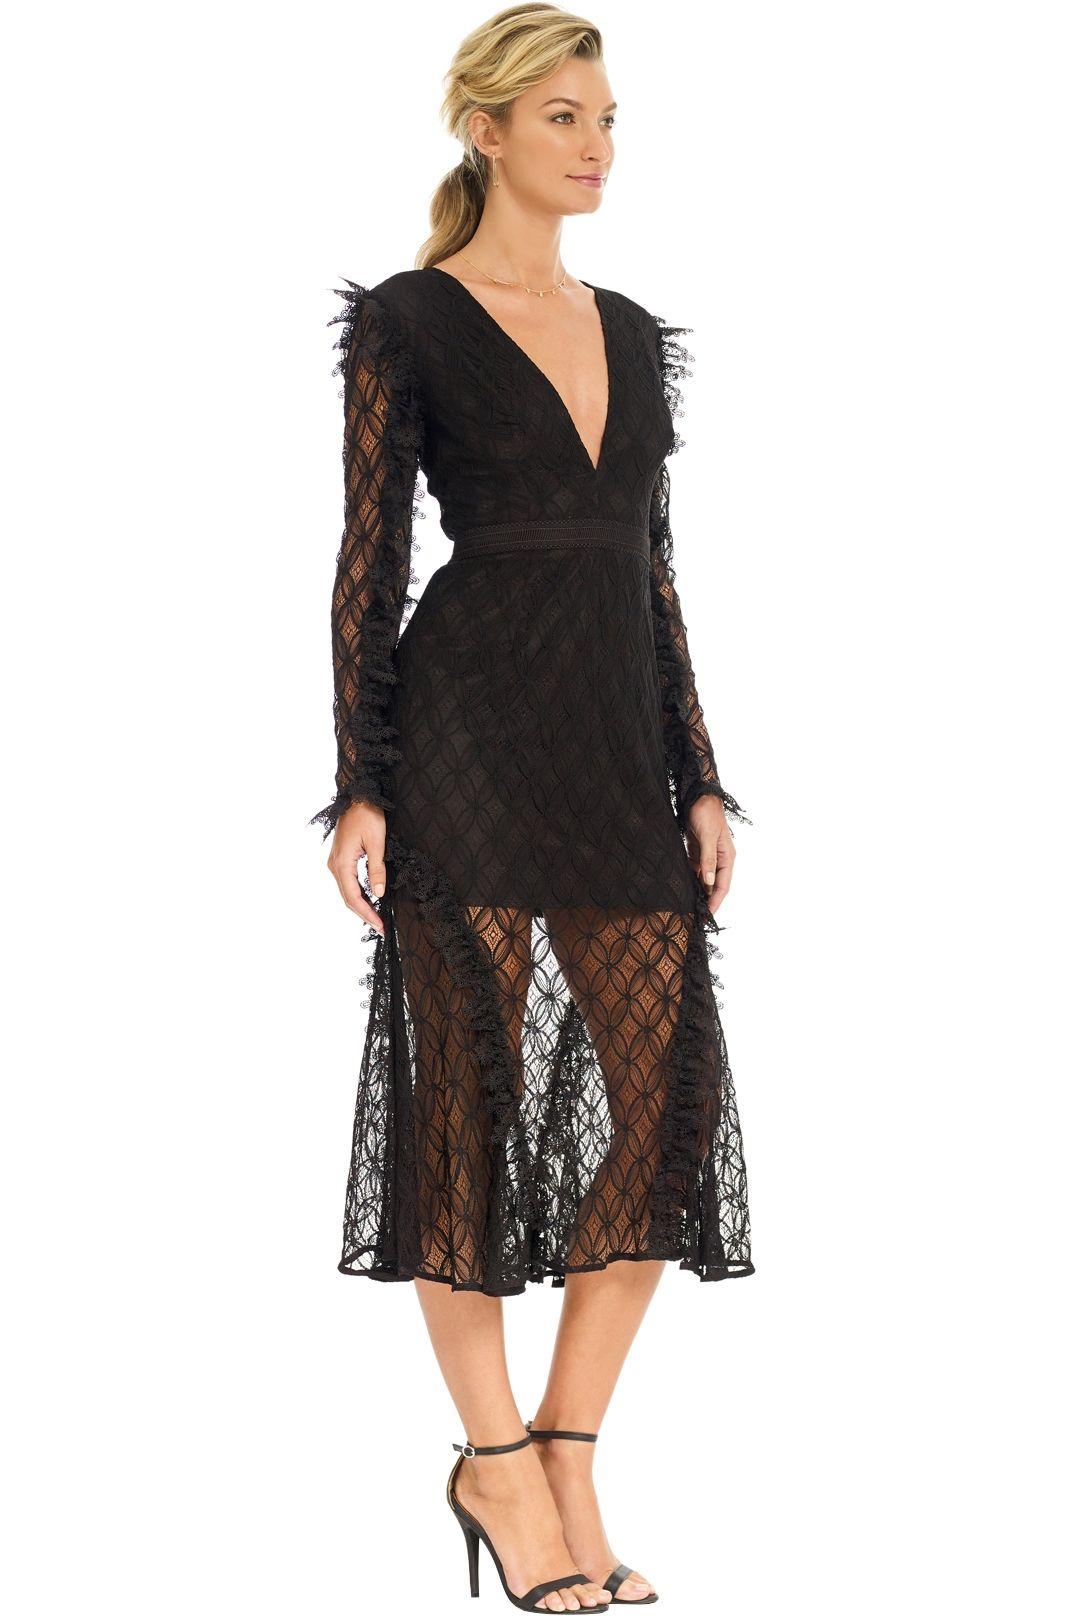 Talulah - Pursue Midi Dress - Black - Side